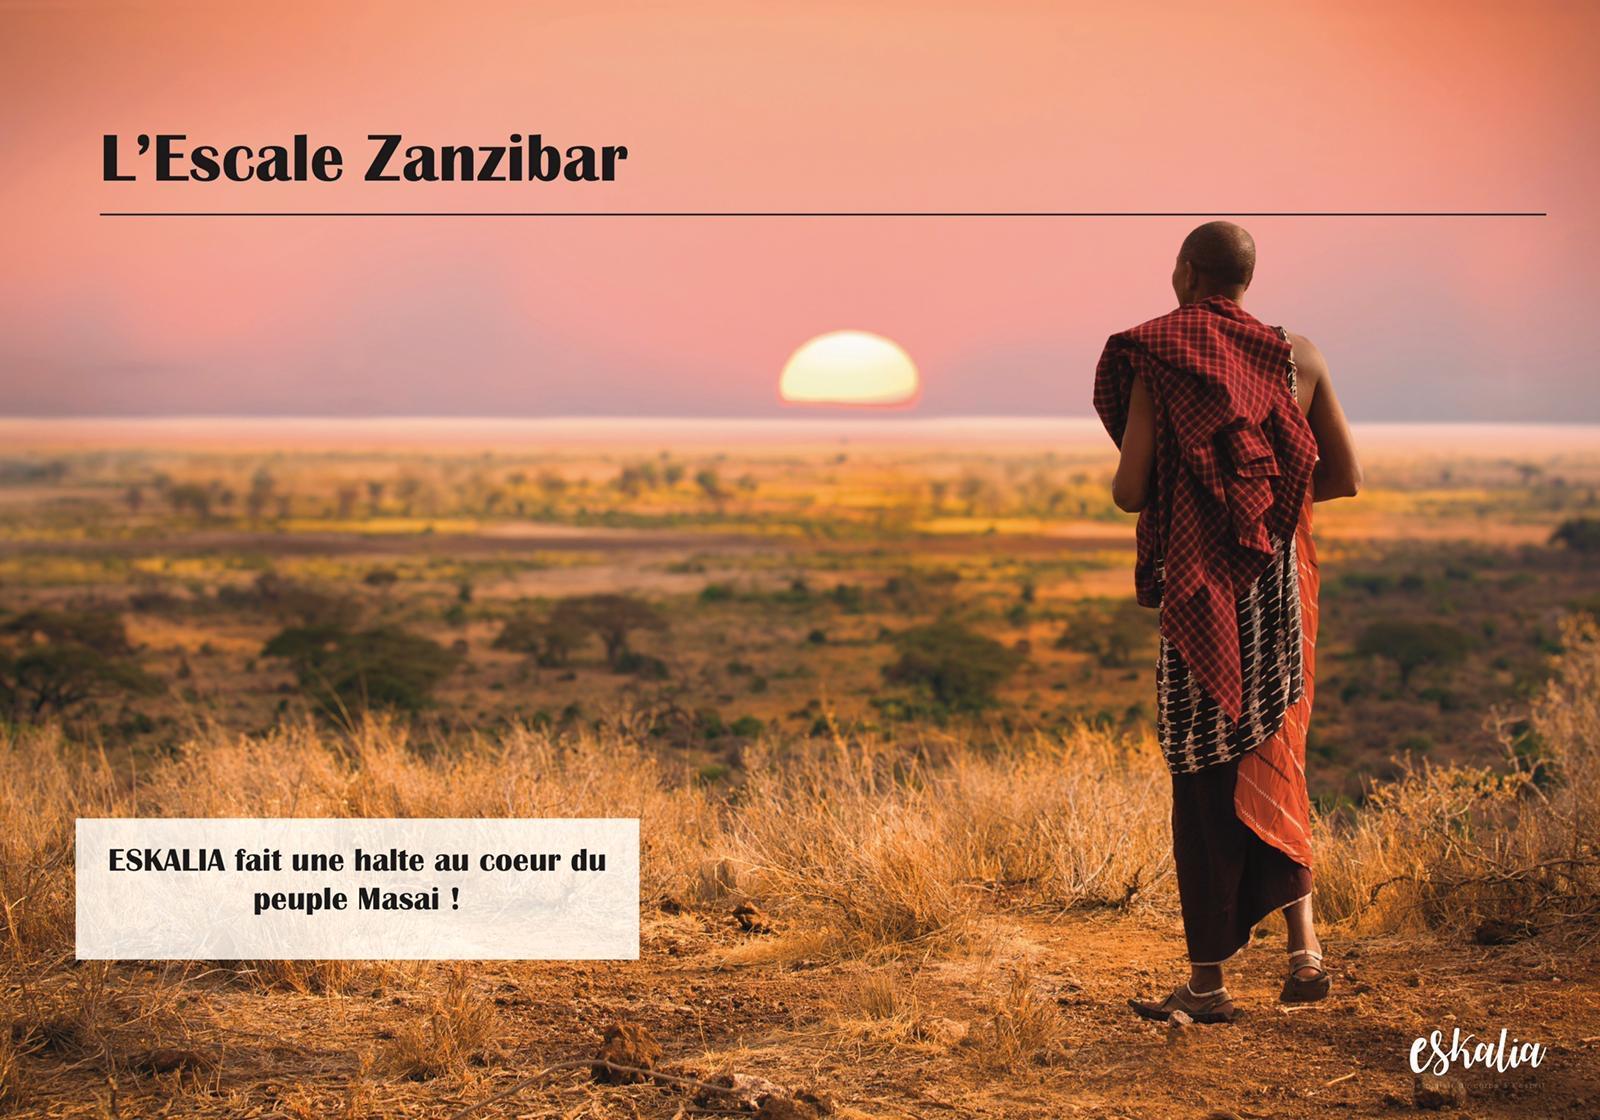 escale zanzibar eskalia gabrielle esthetique